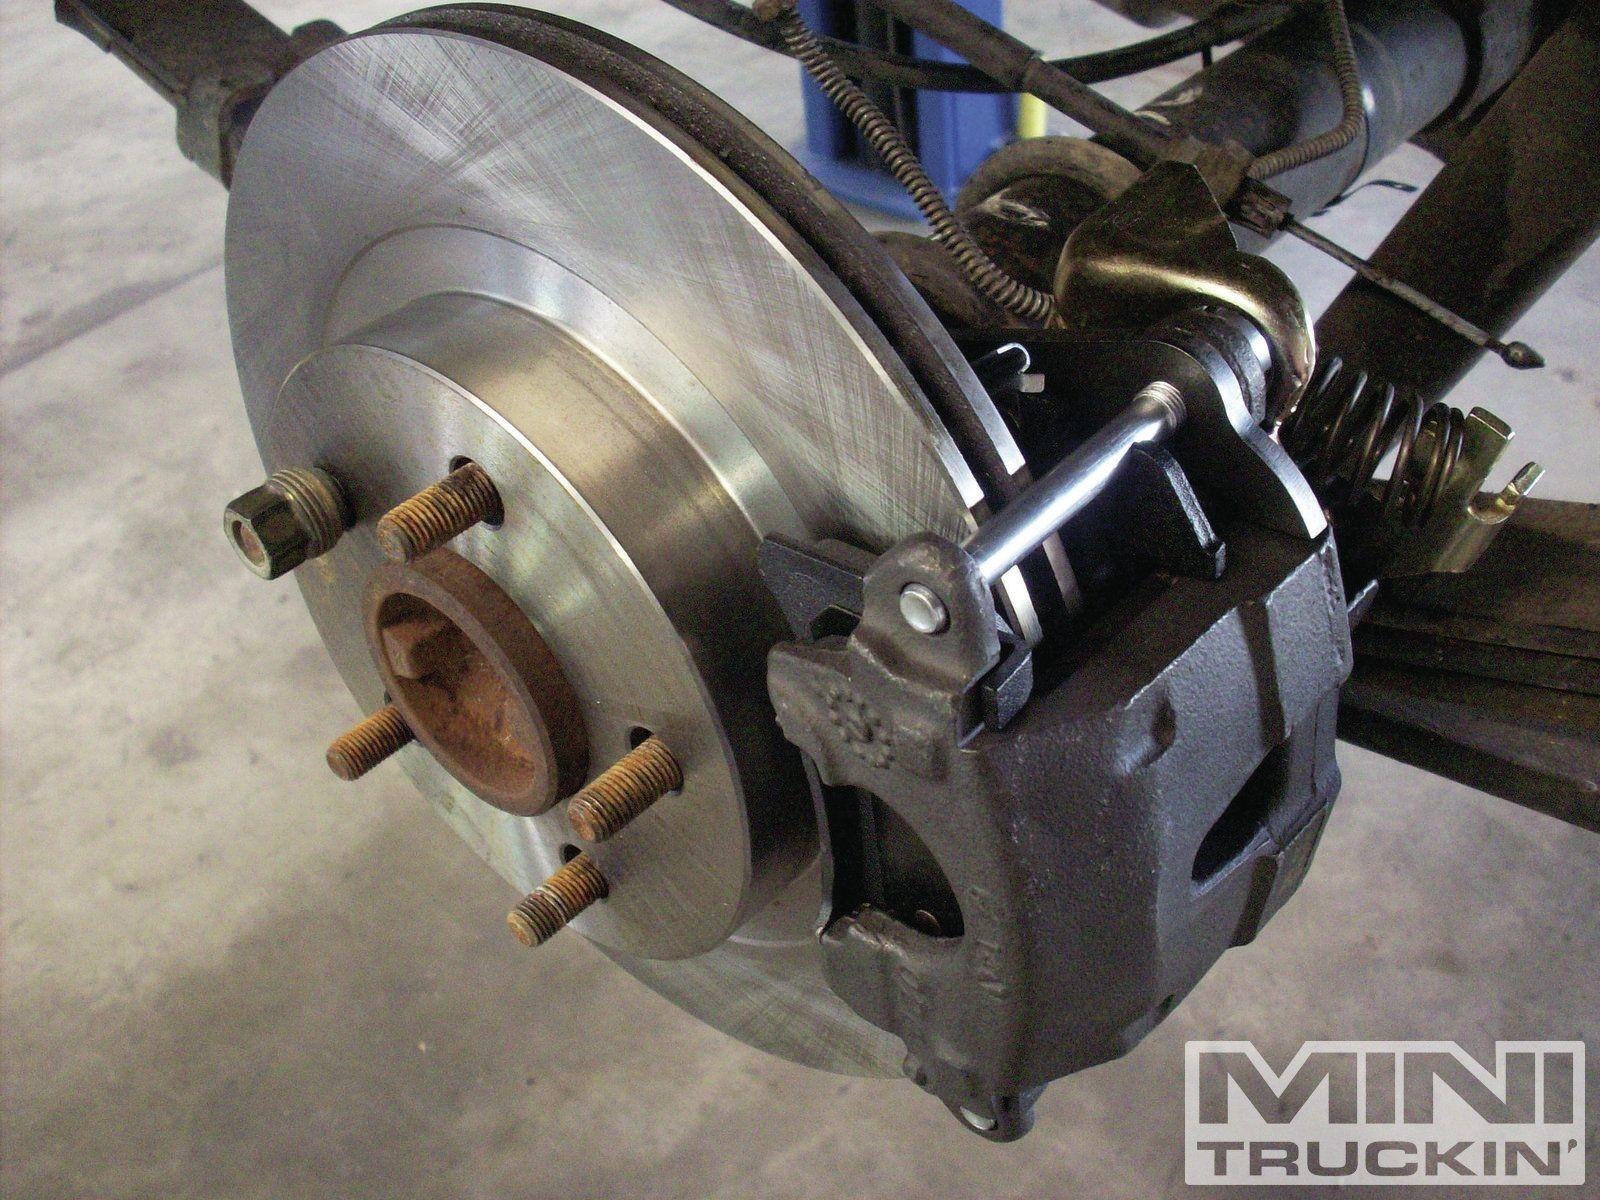 Disc Brake Schematic Diagram Chevy S10 Rear Disc Brake Conversion bye bye to Dumb Drums Mini